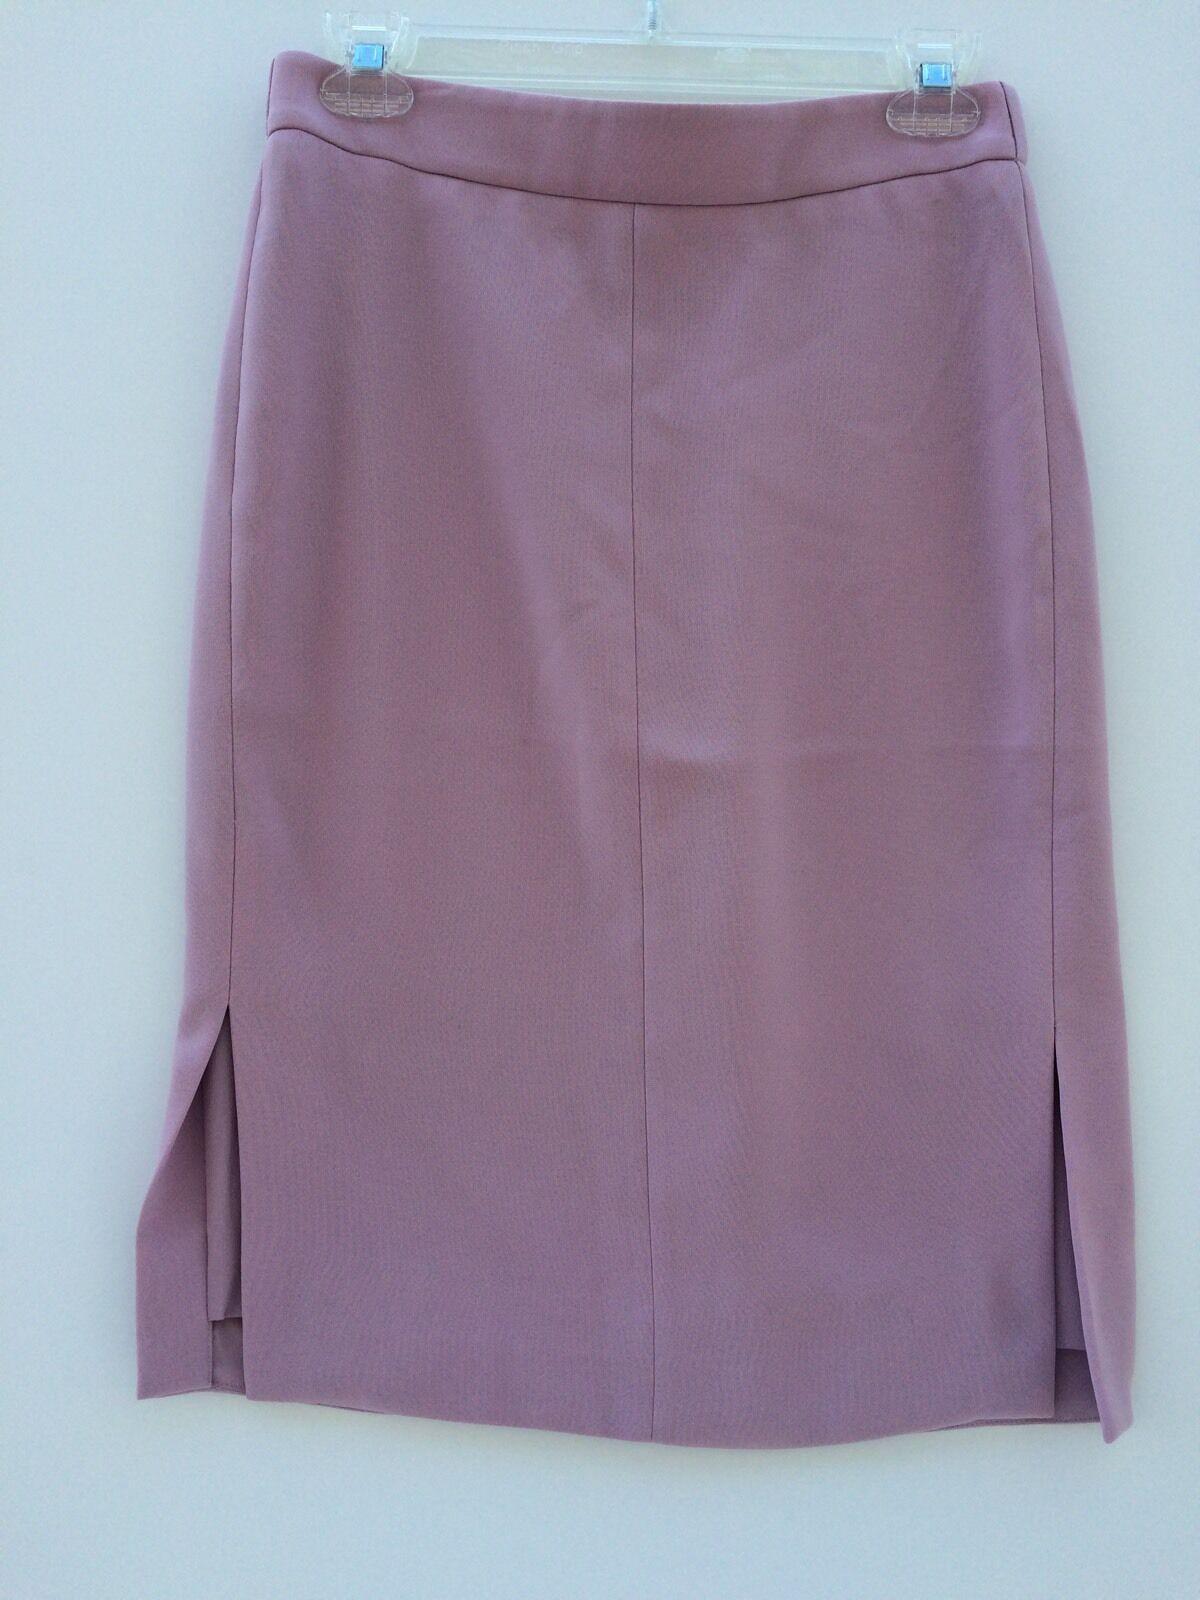 J Crew Womens Pale purplec Skirt Sz.0